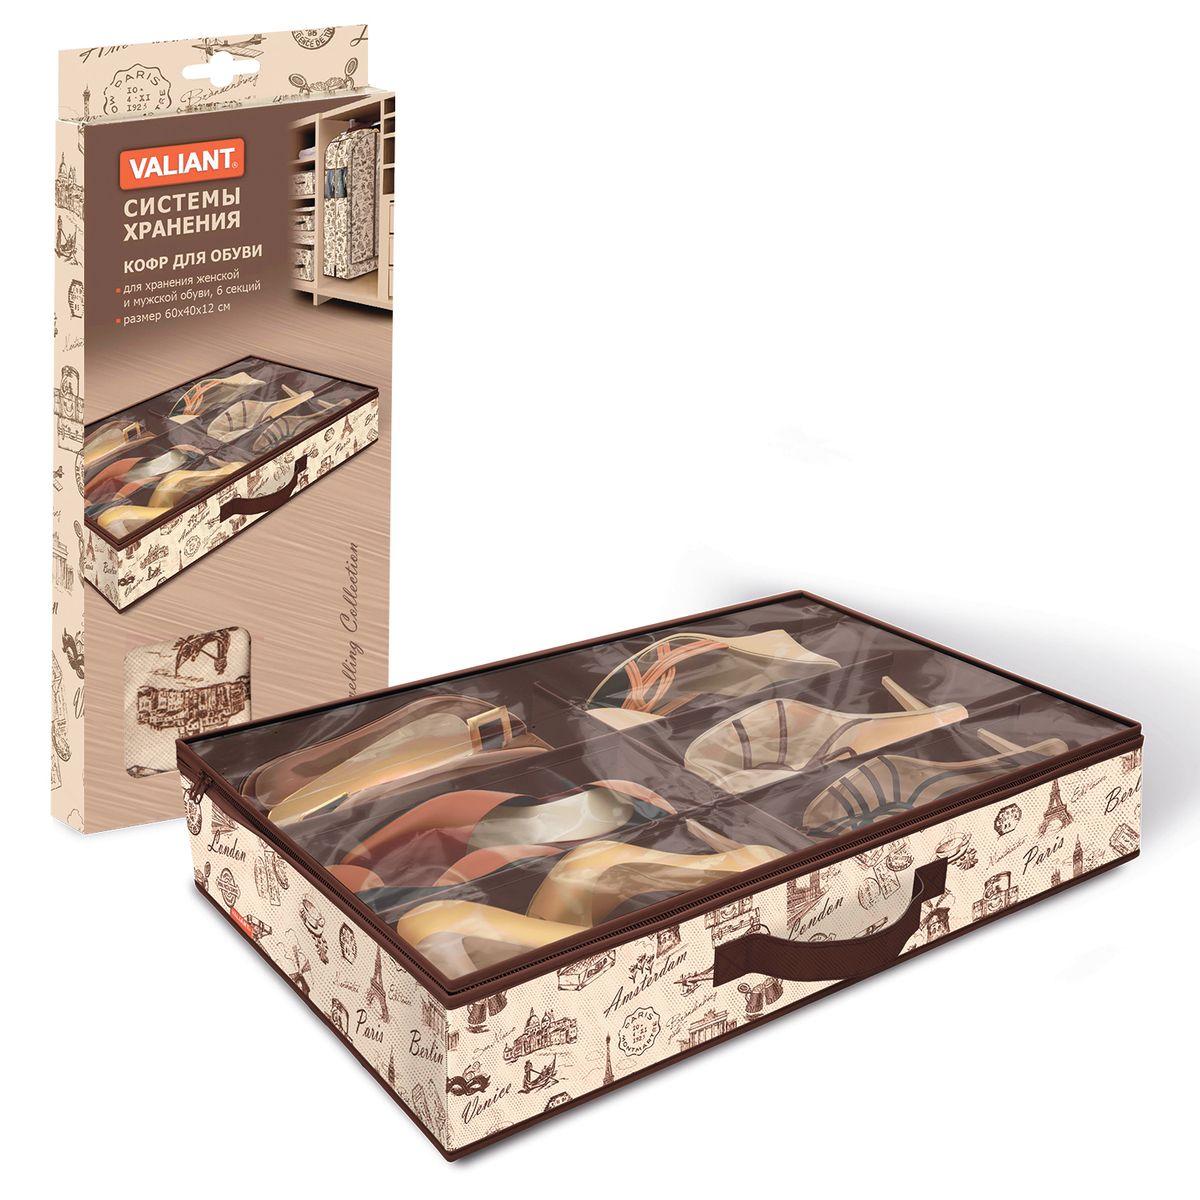 Фото - Кофр для хранения обуви Valiant Collection, 6 секций, 60 х 40 х 12 см кофр для хранения обуви valiant japanese white 6 секций 60 х 40 х 12 см